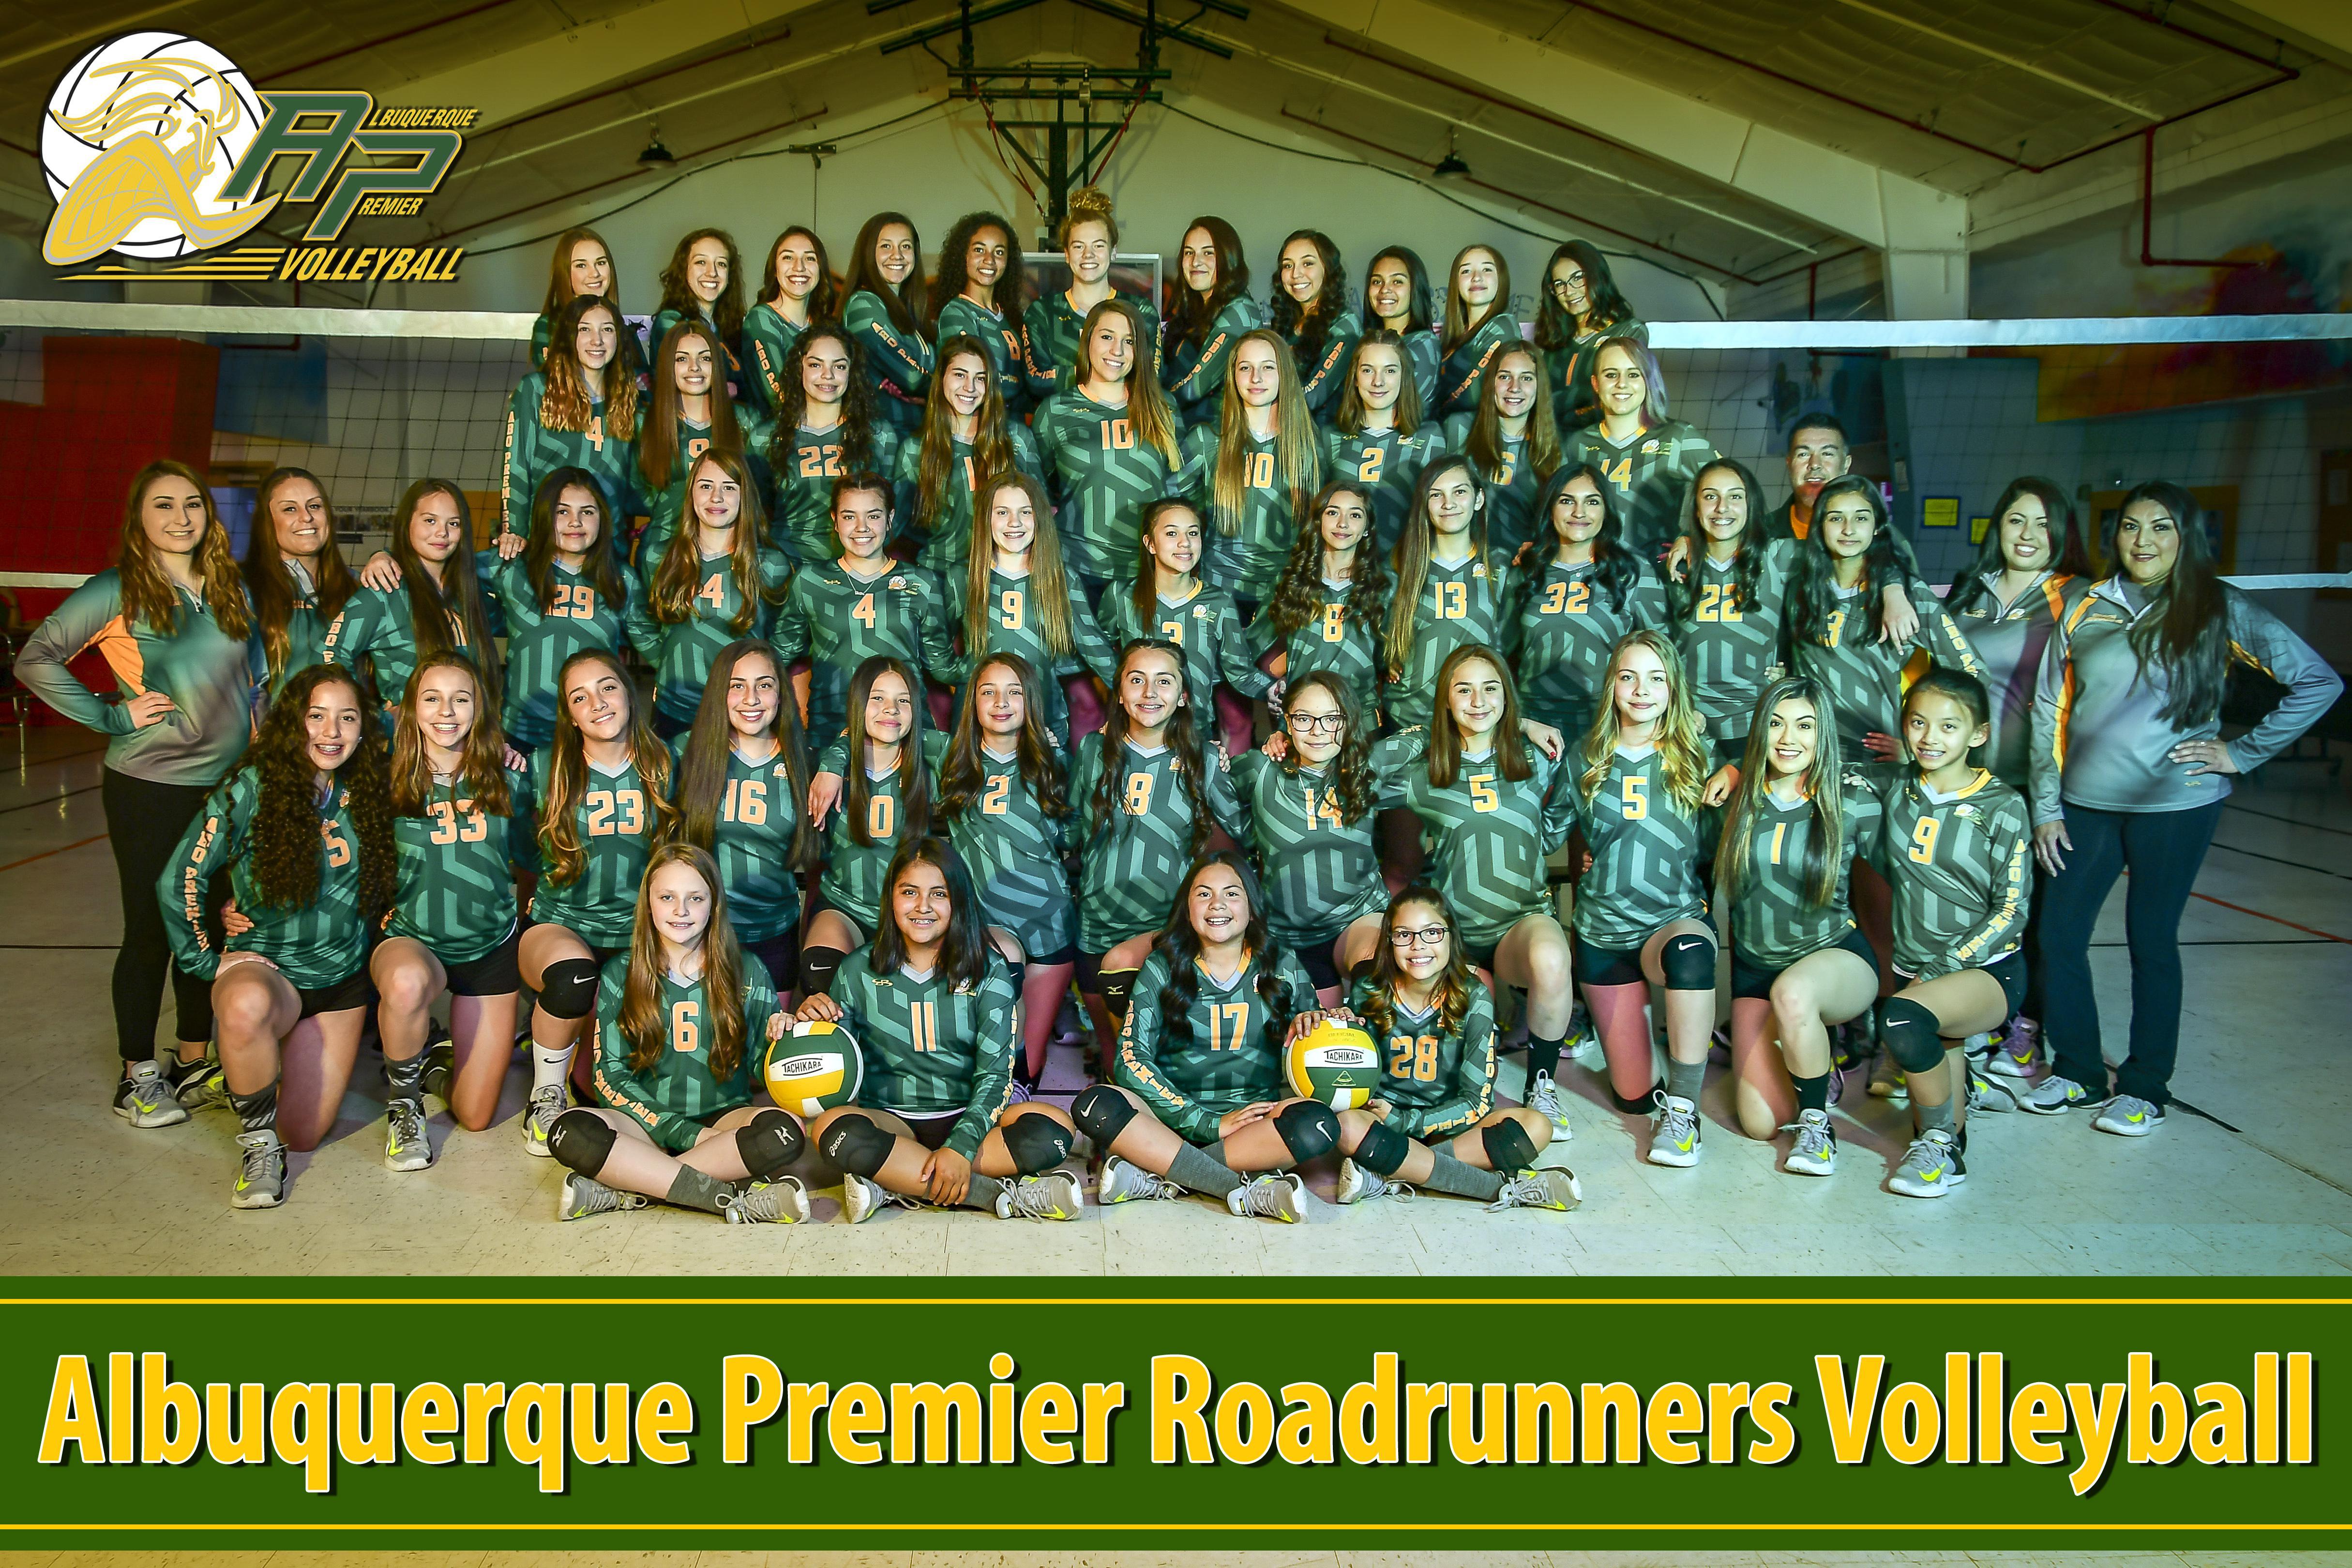 Albuquerque Premier Roadrunners Volleyball